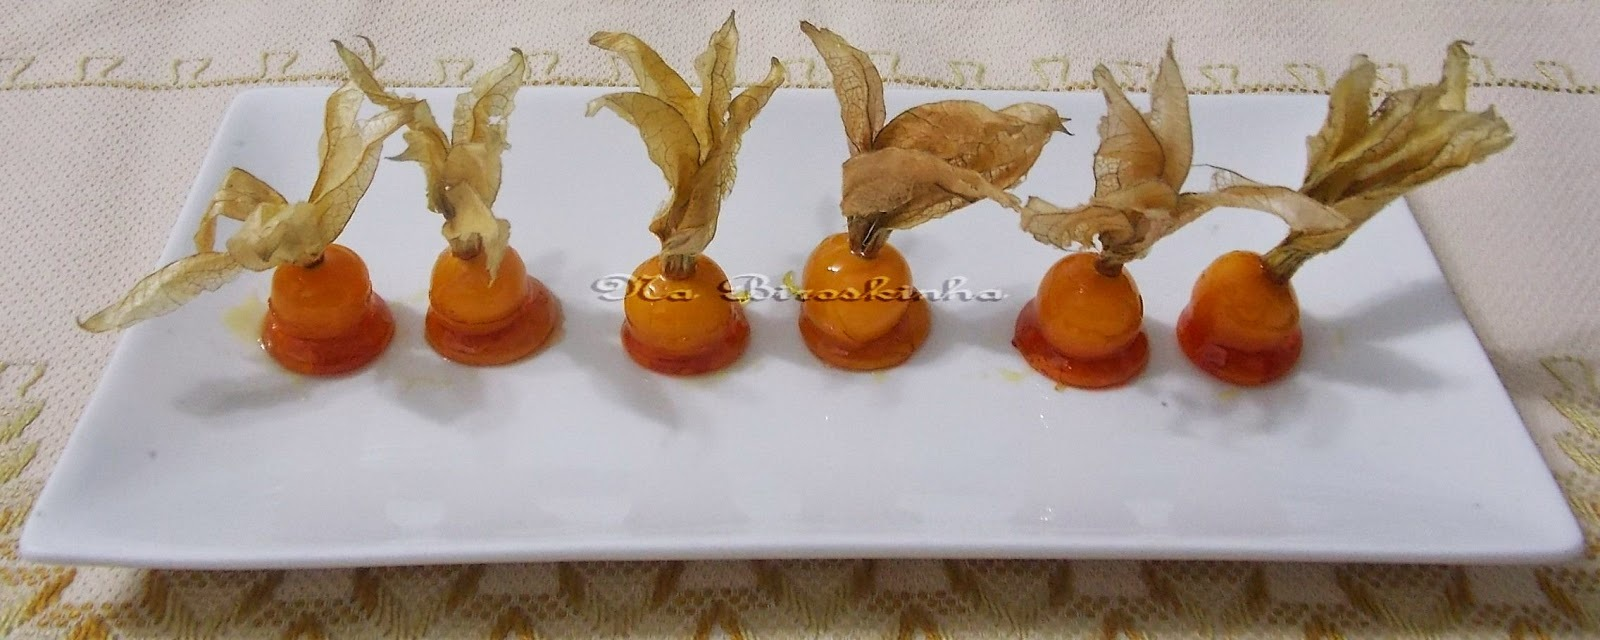 Physalis Caramelada